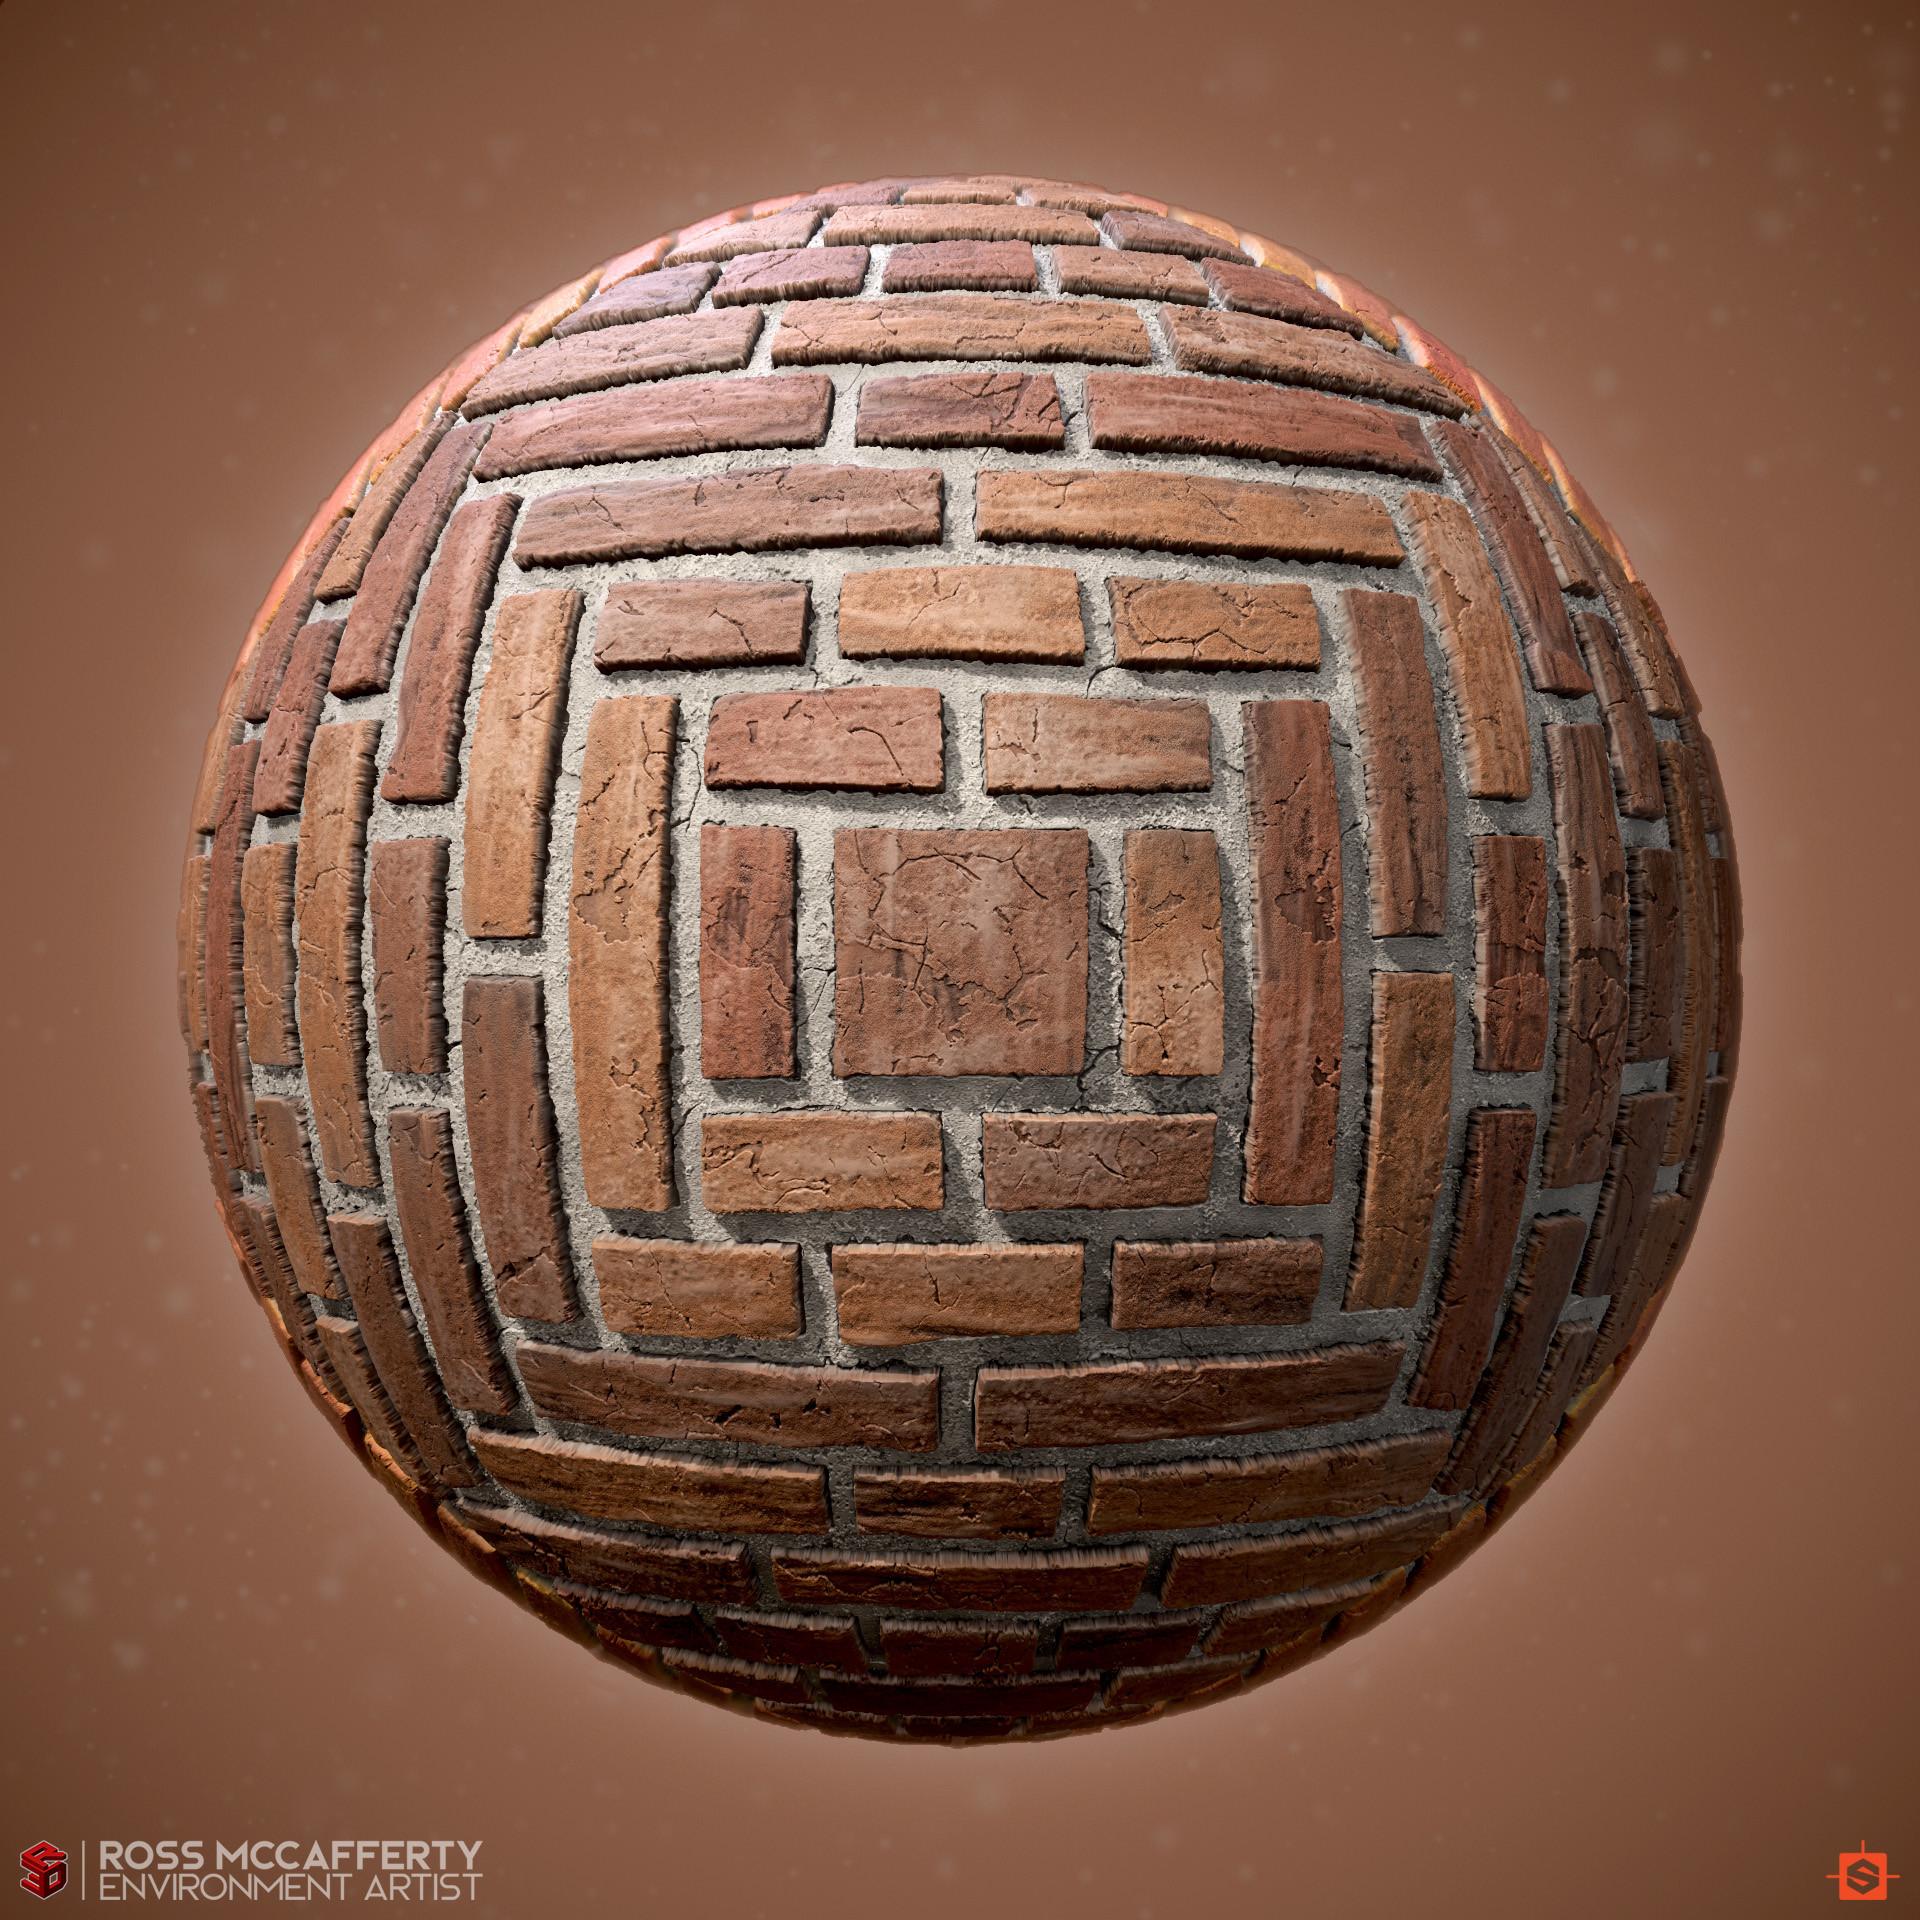 Ross mccafferty brick 02